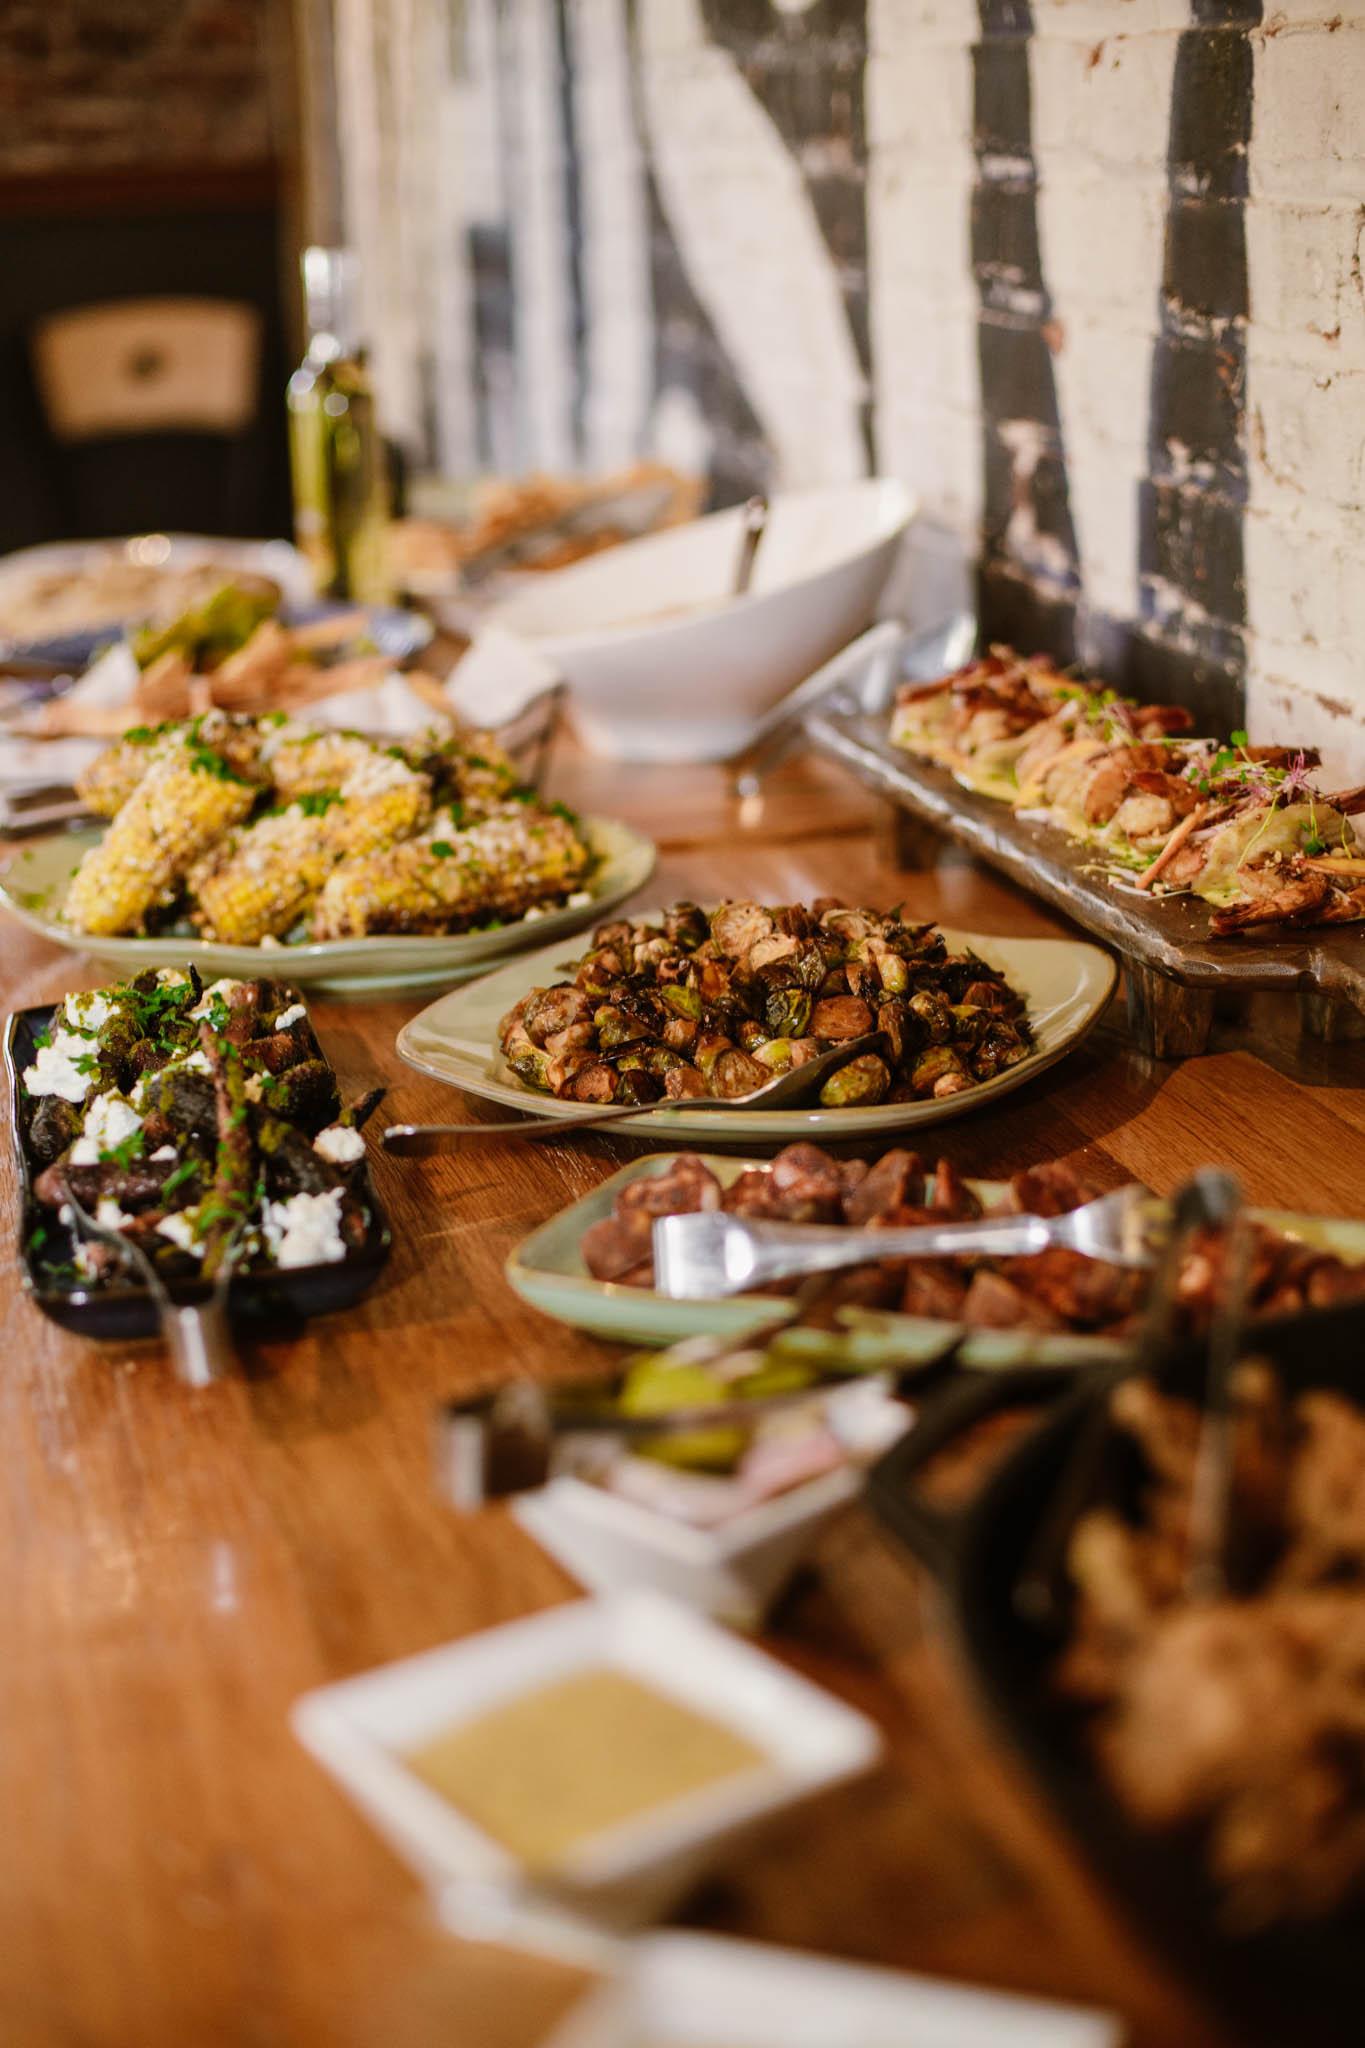 Charlottesville-Editorial-food-photographer_018.jpg